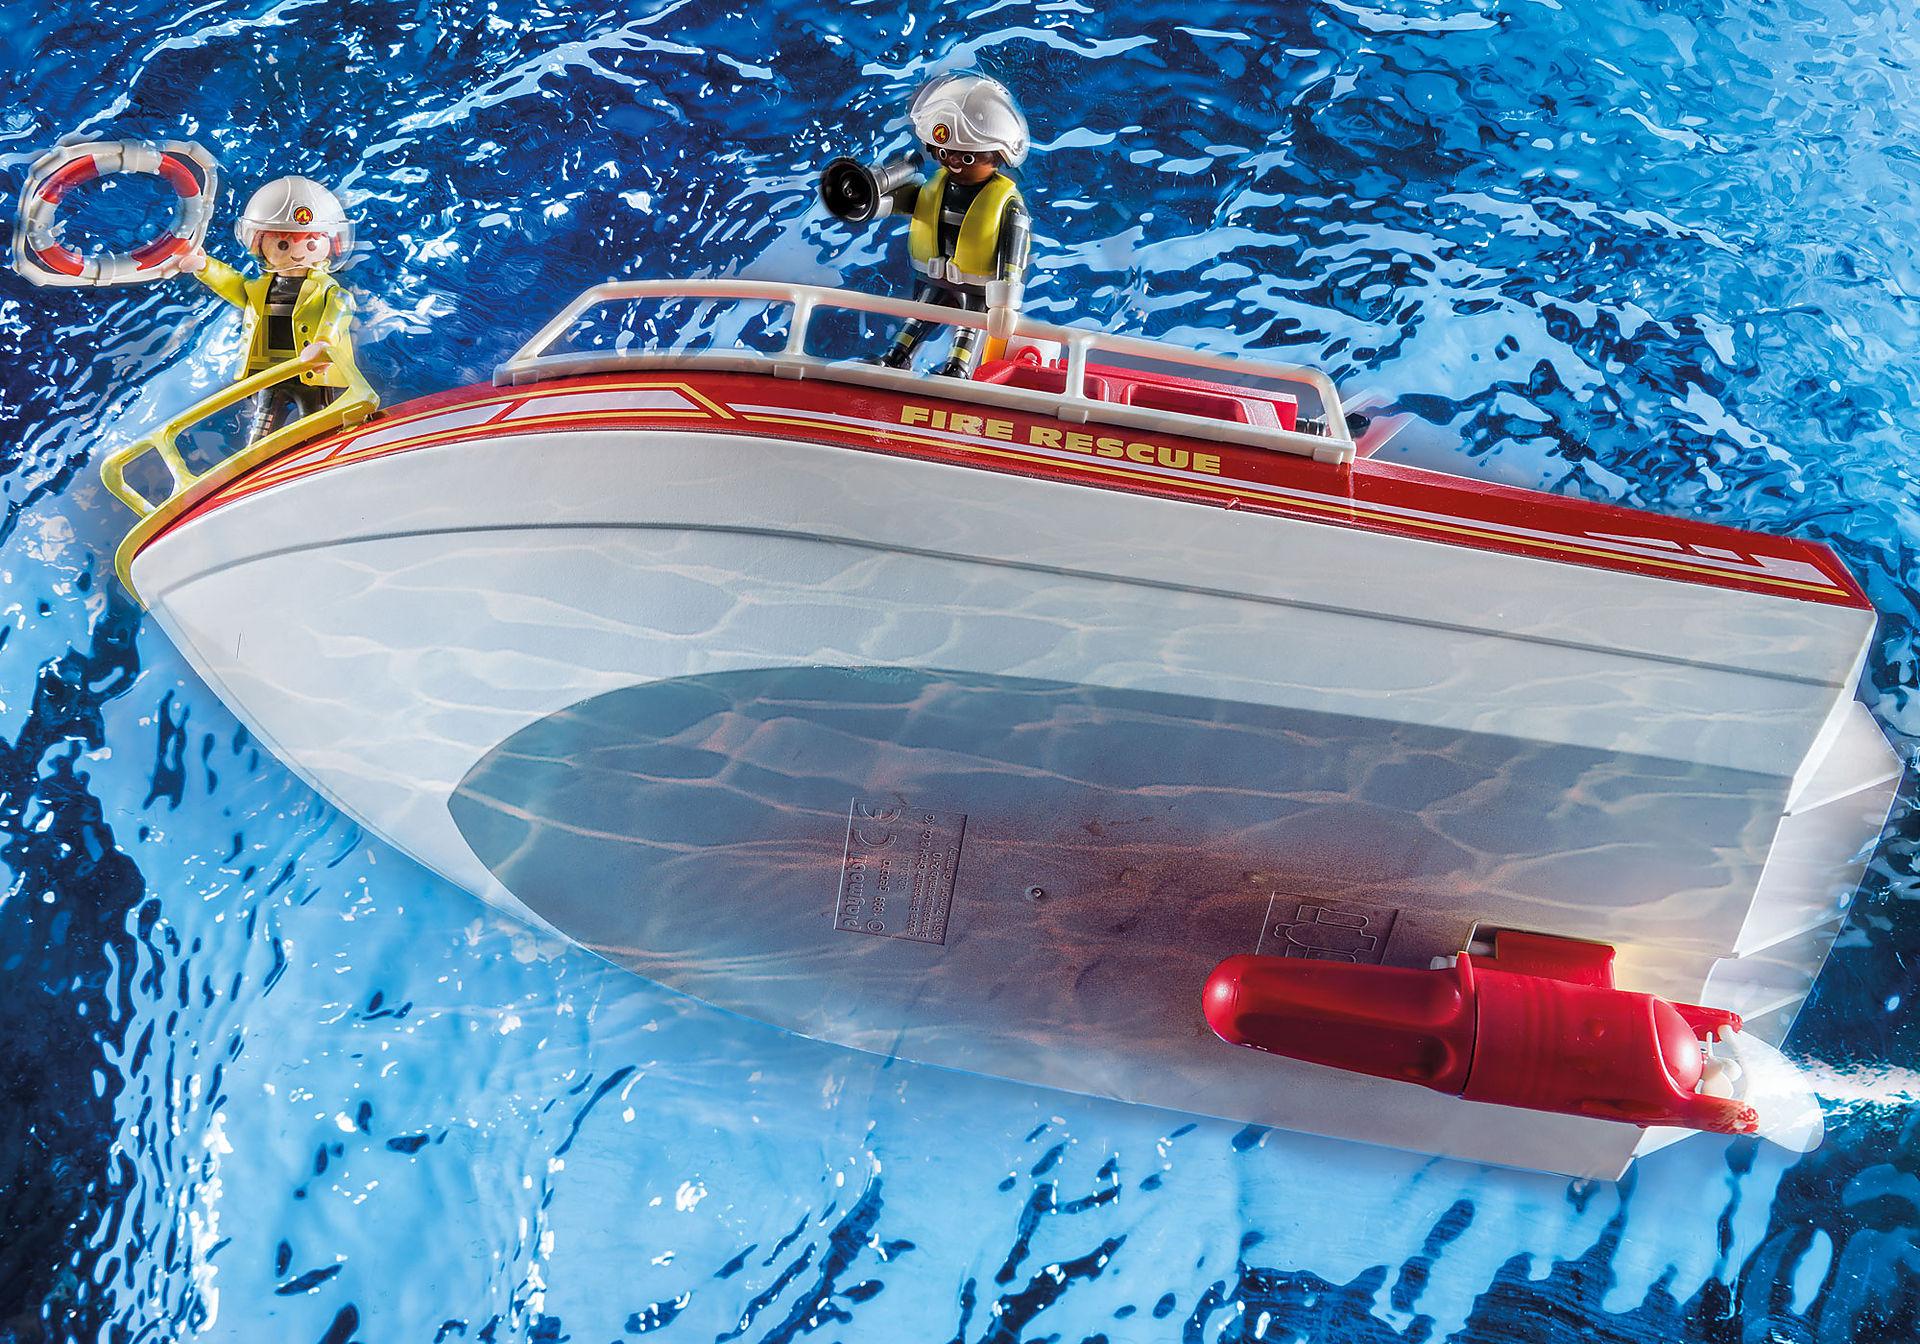 70147 Barco de Resgate dos Bombeiros zoom image7